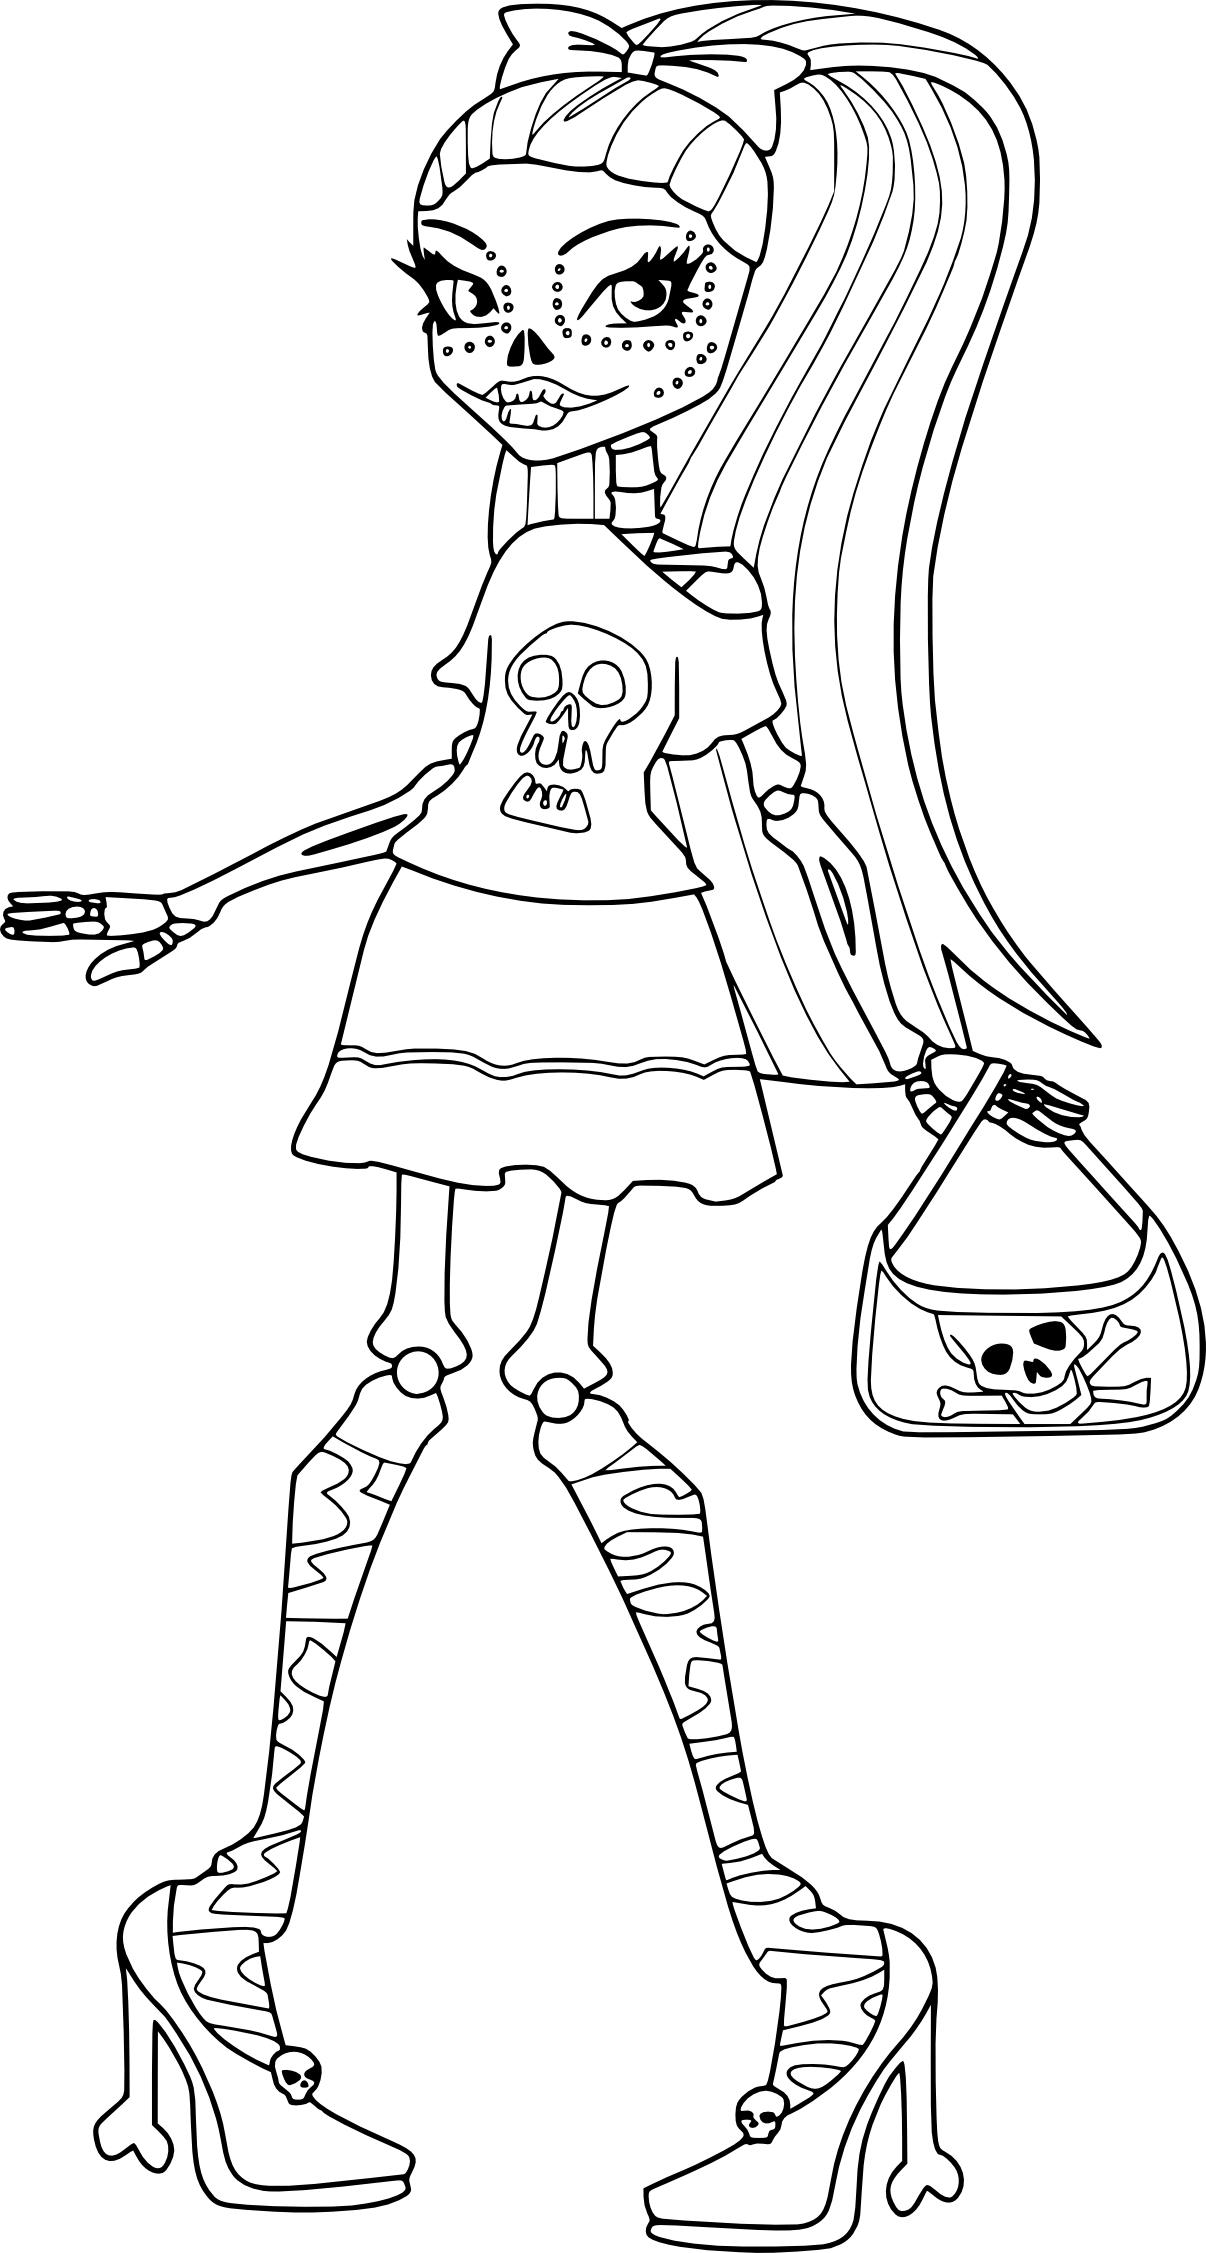 Coloriage Skelita Monster High à imprimer et colorier